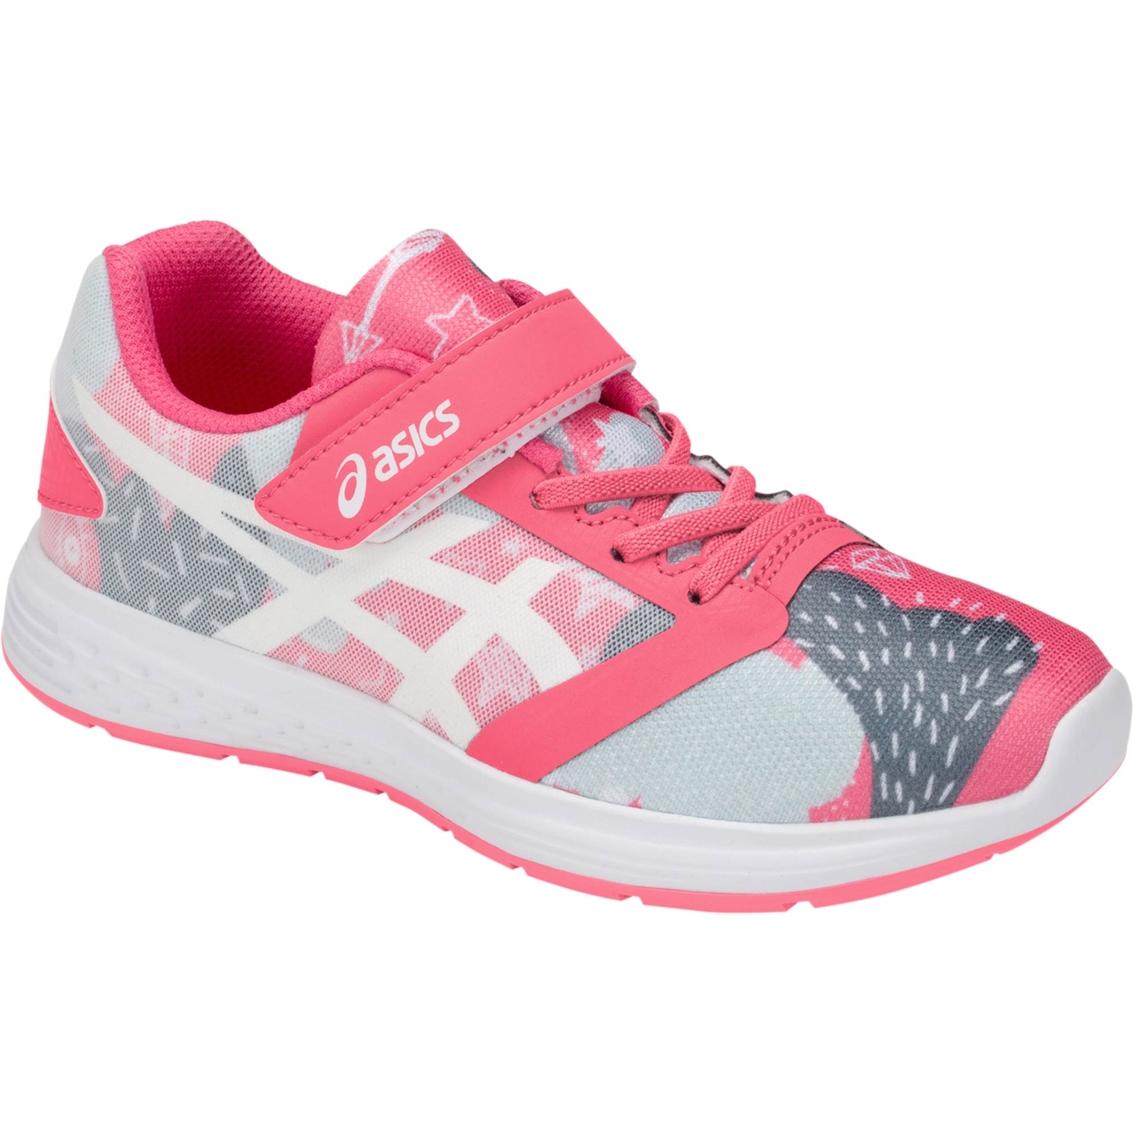 ba4adfc050bebb Asics Little Girls Patriot 10 Ps Running Shoes | Children's Athletic ...